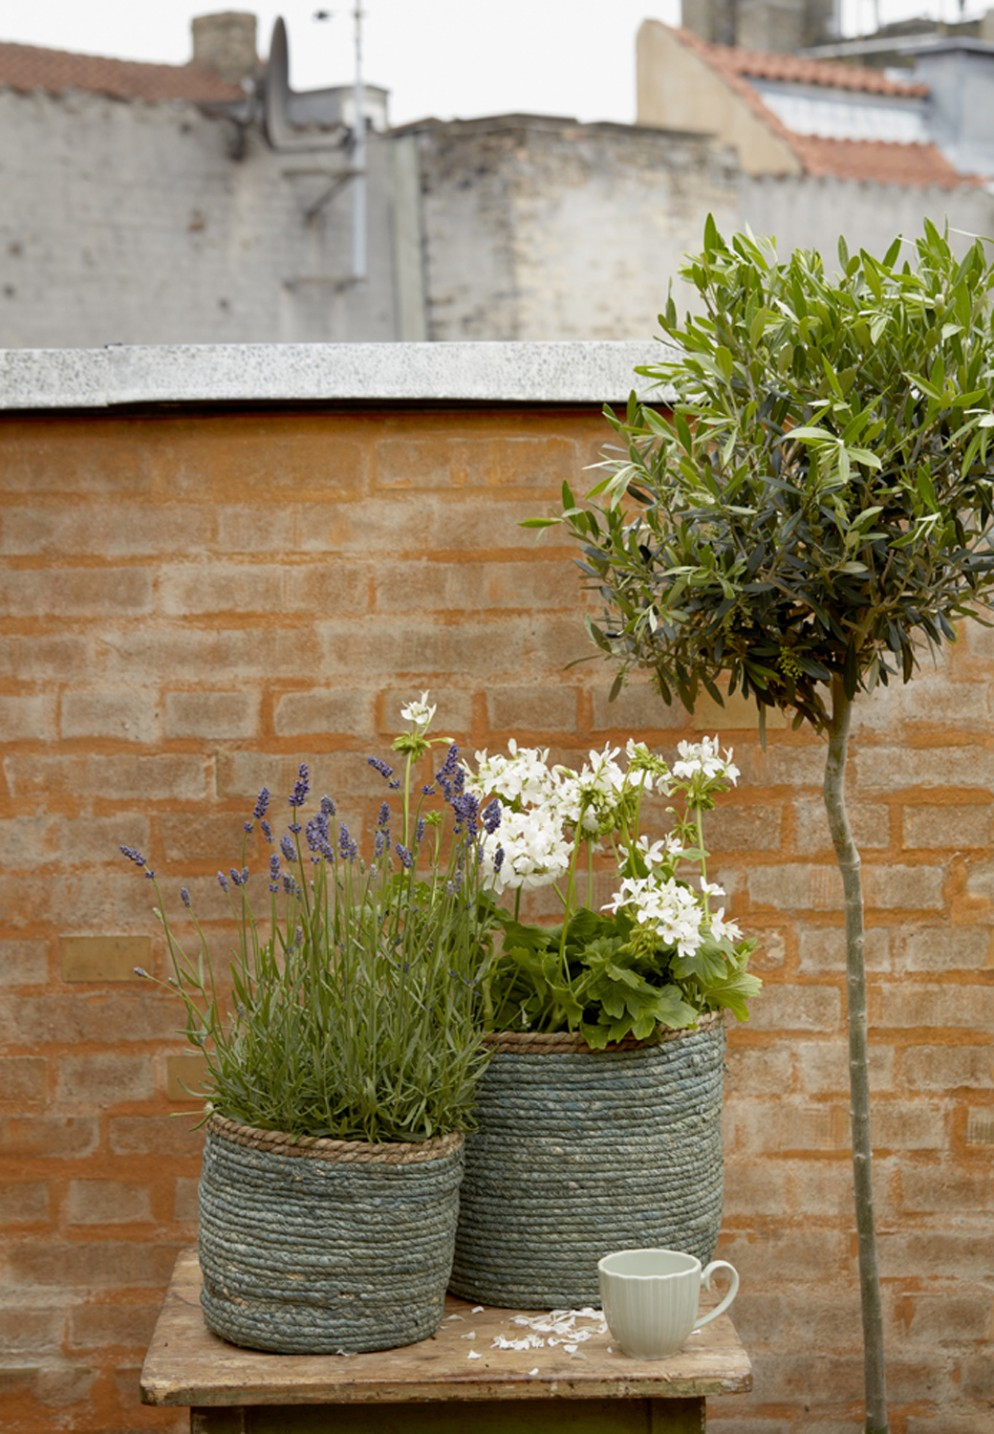 piante-da-balcone-resistenti-2. Geraniums_4000_Urban Summer Escapes_17-livingcorriere